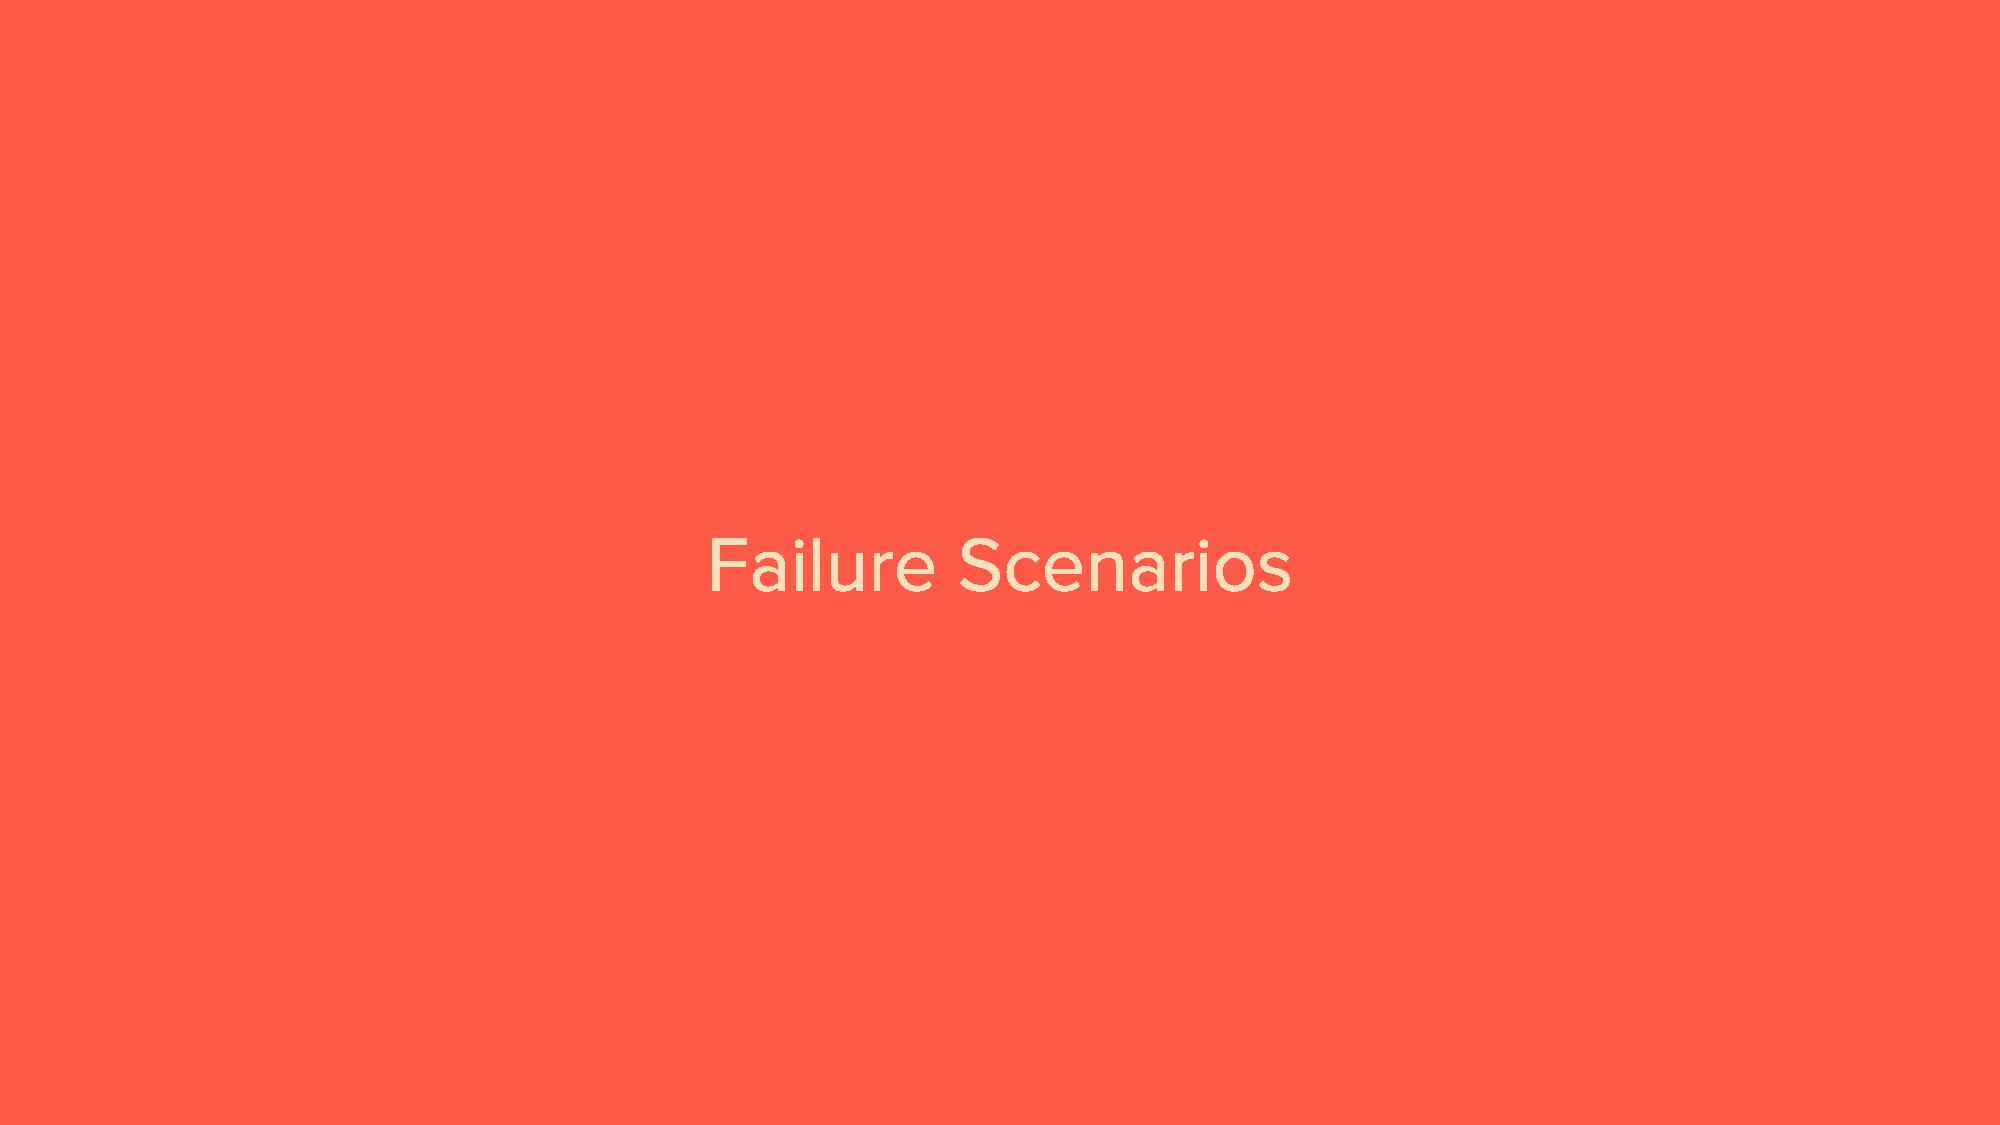 Autocomplete - Failure Scenarios_Page_06.png